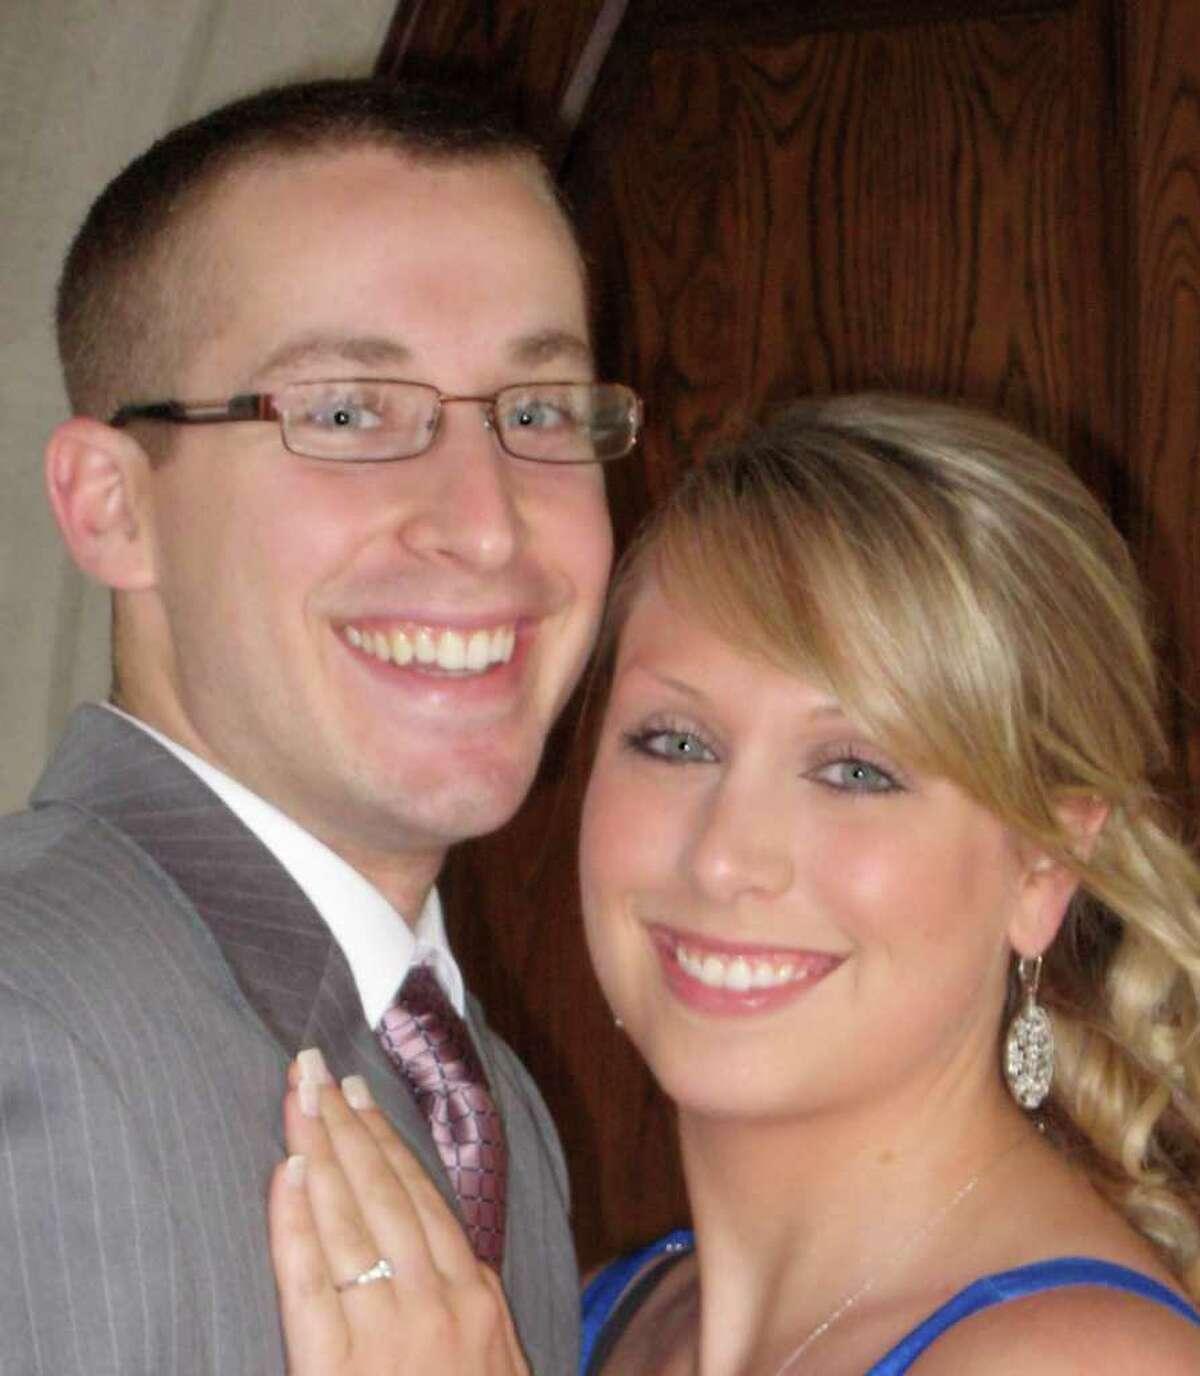 Lindsay Burke and Robert Accosta are engaged.